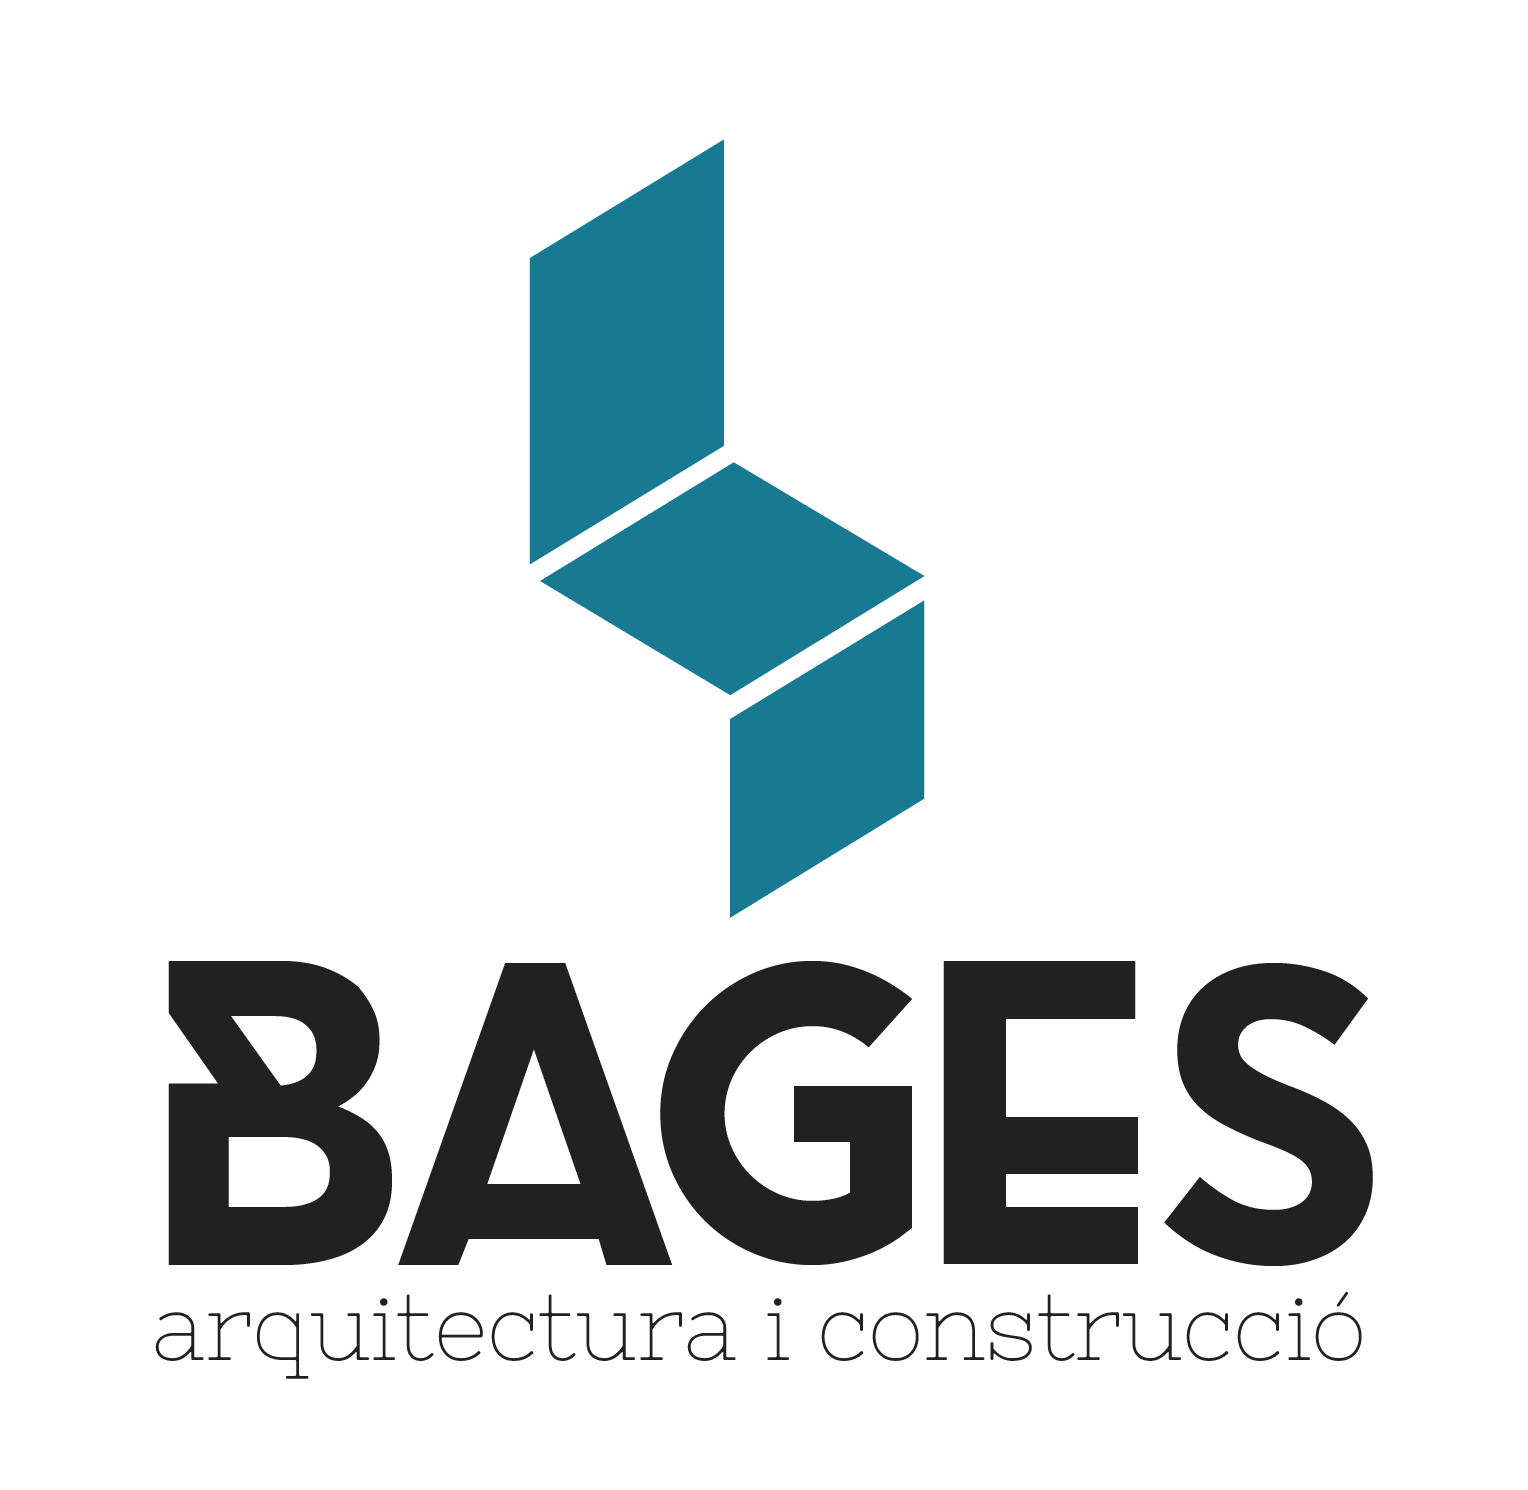 Sergio Bagés